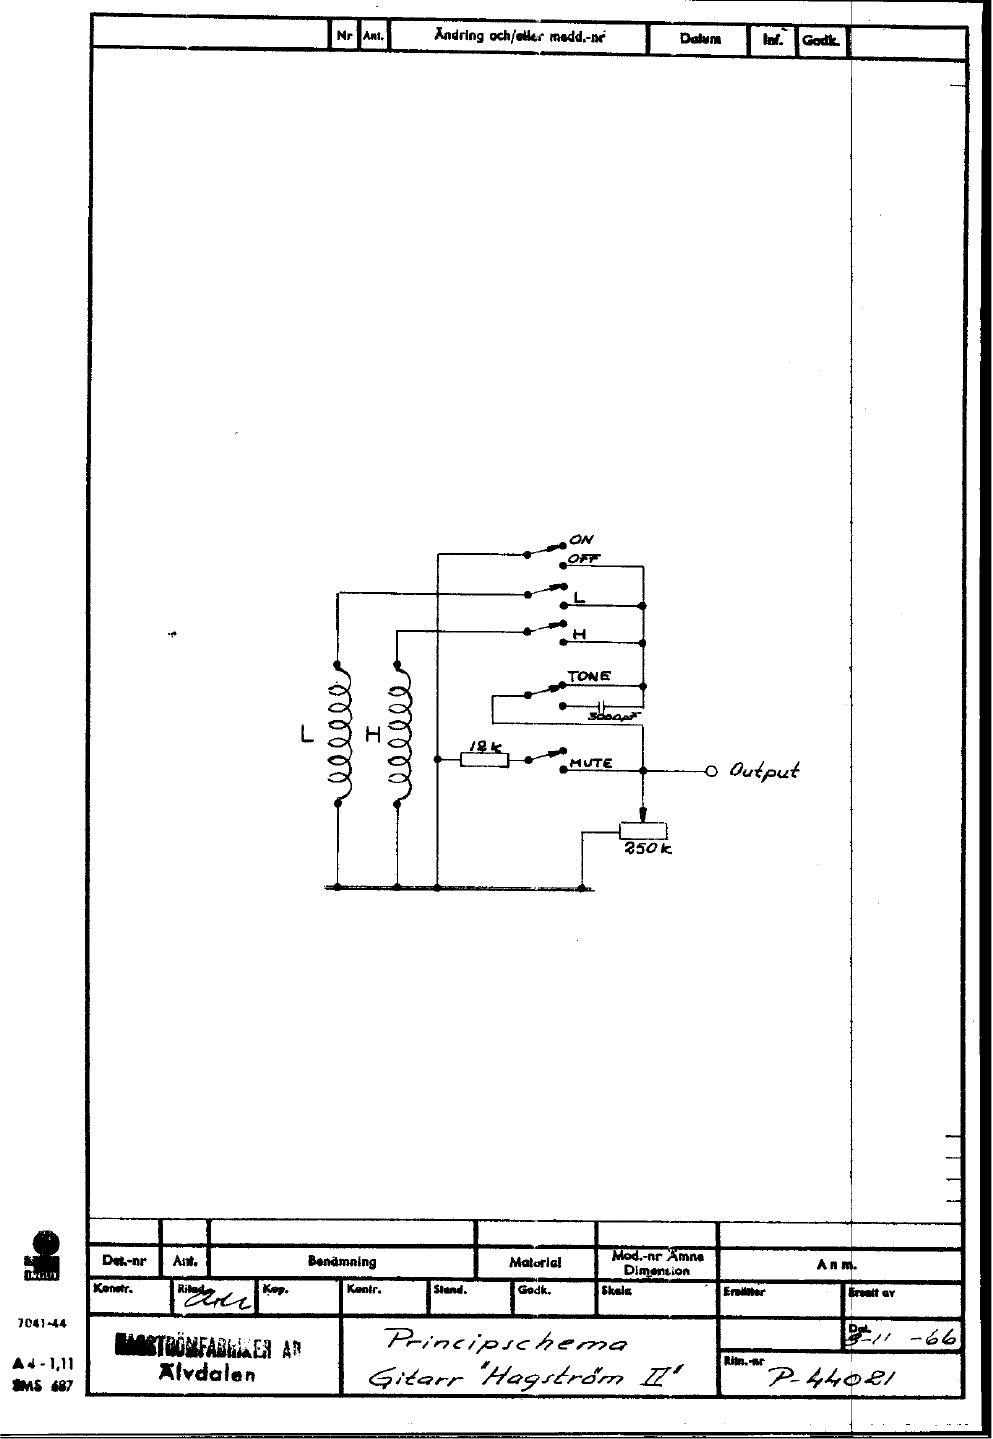 Hagstrom Guitar Wiring Diagram : Guitar wiring drawings switching systemhagstromhagstromii